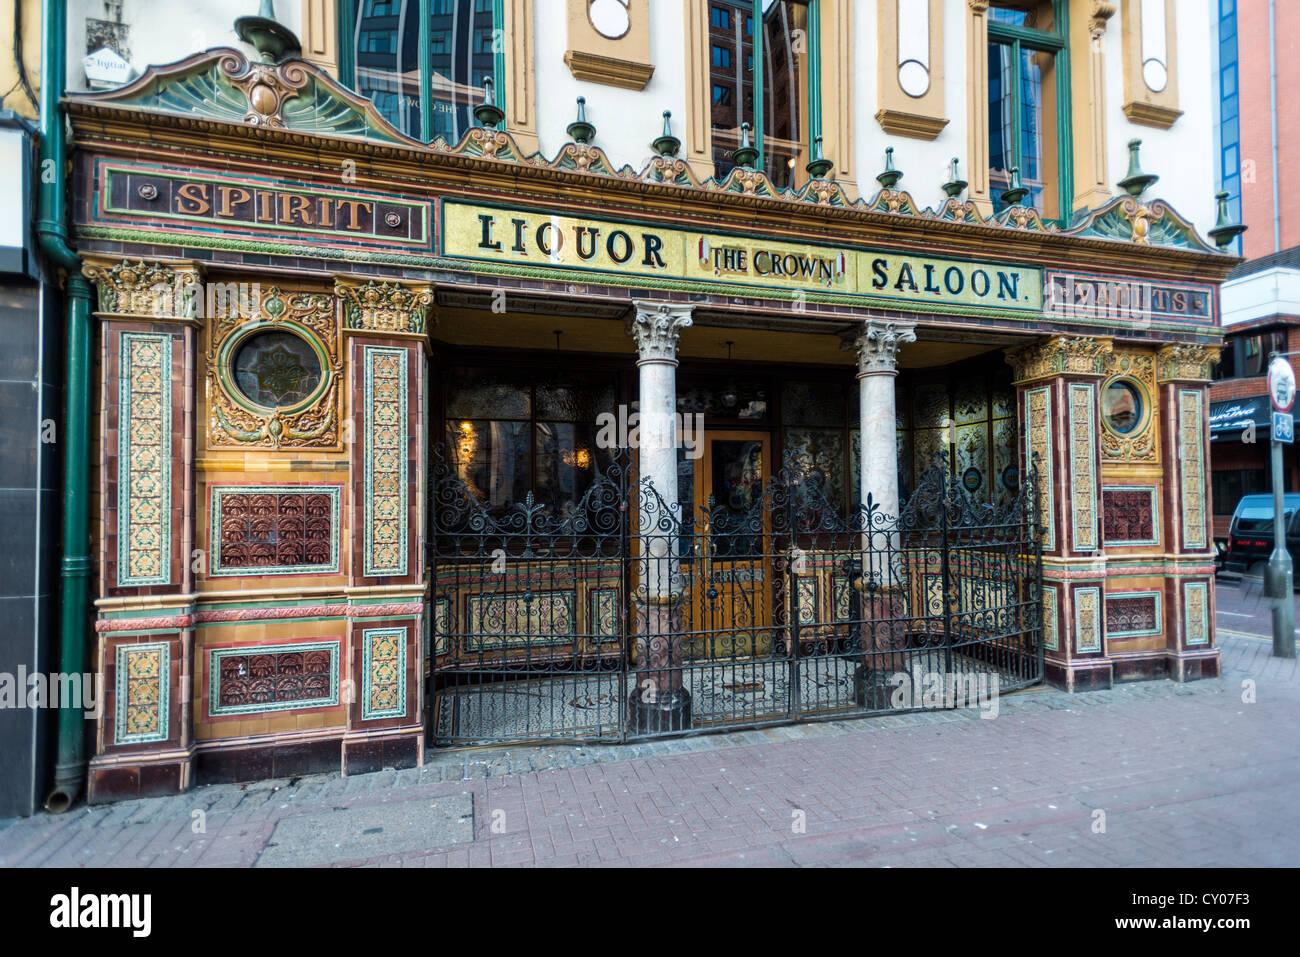 Crown Liquor Saloon, Belfast, Northern Ireland, United Kingdom, Europe - Stock Image